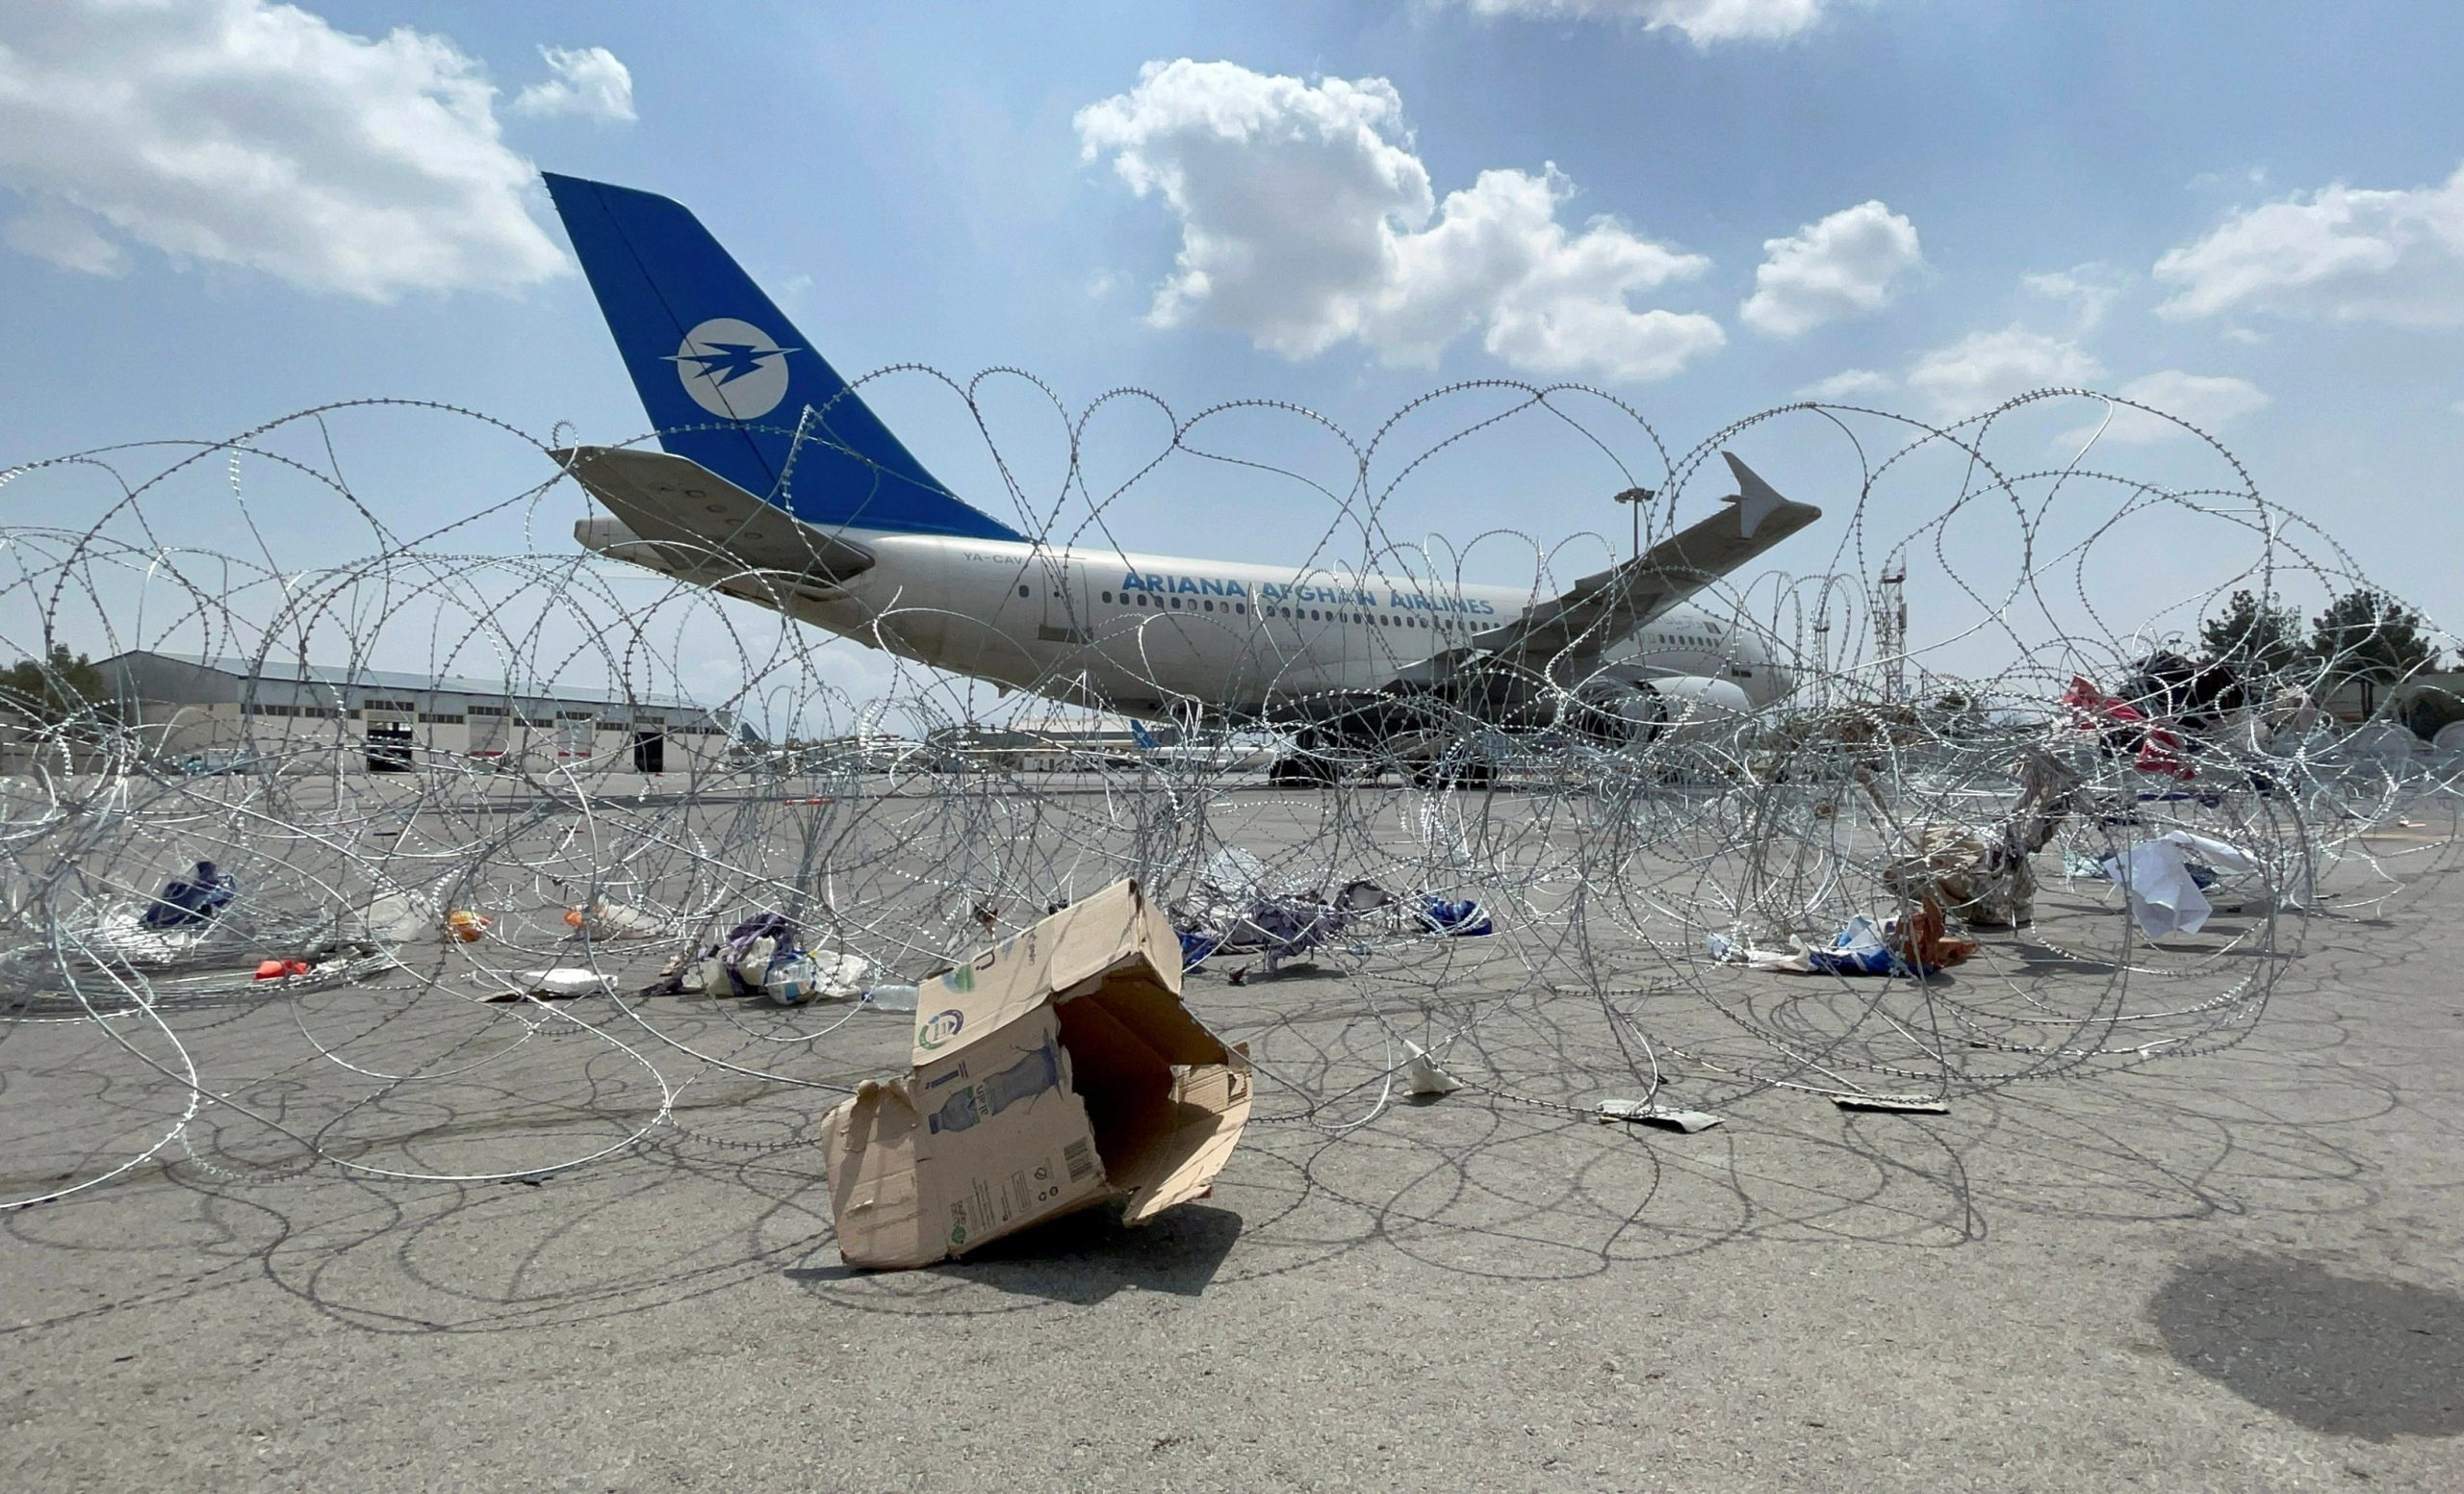 Kabul airport reopens to receive aid: Qatari envoy